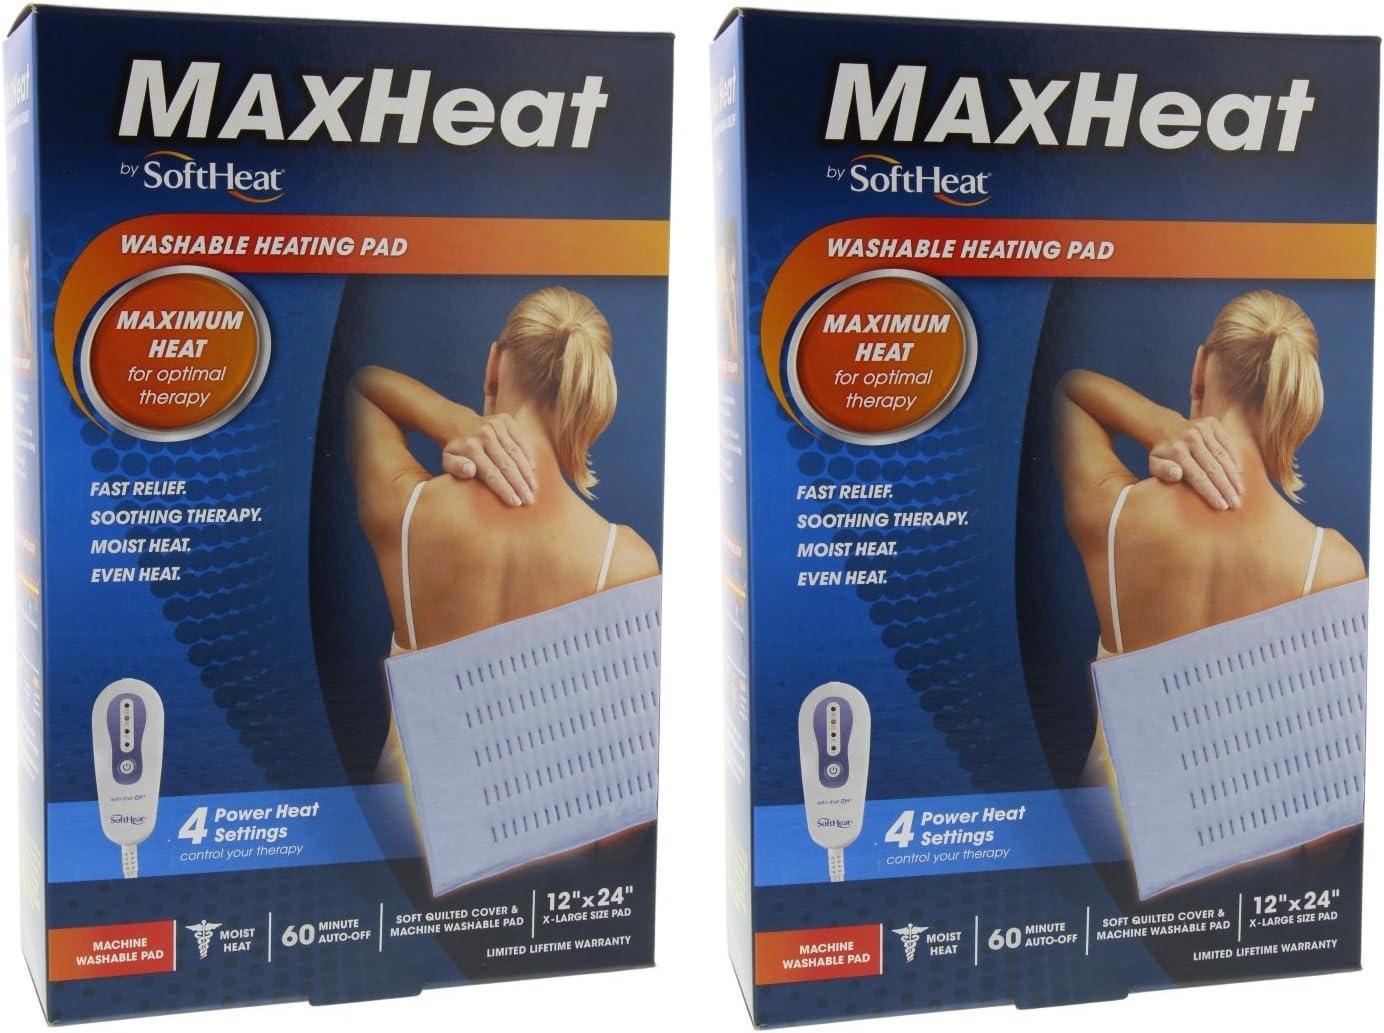 "SoftHeat MaxHeat Washable Heating Pad 12"" x 24"" X-Large Size Pad (2 Pack)"